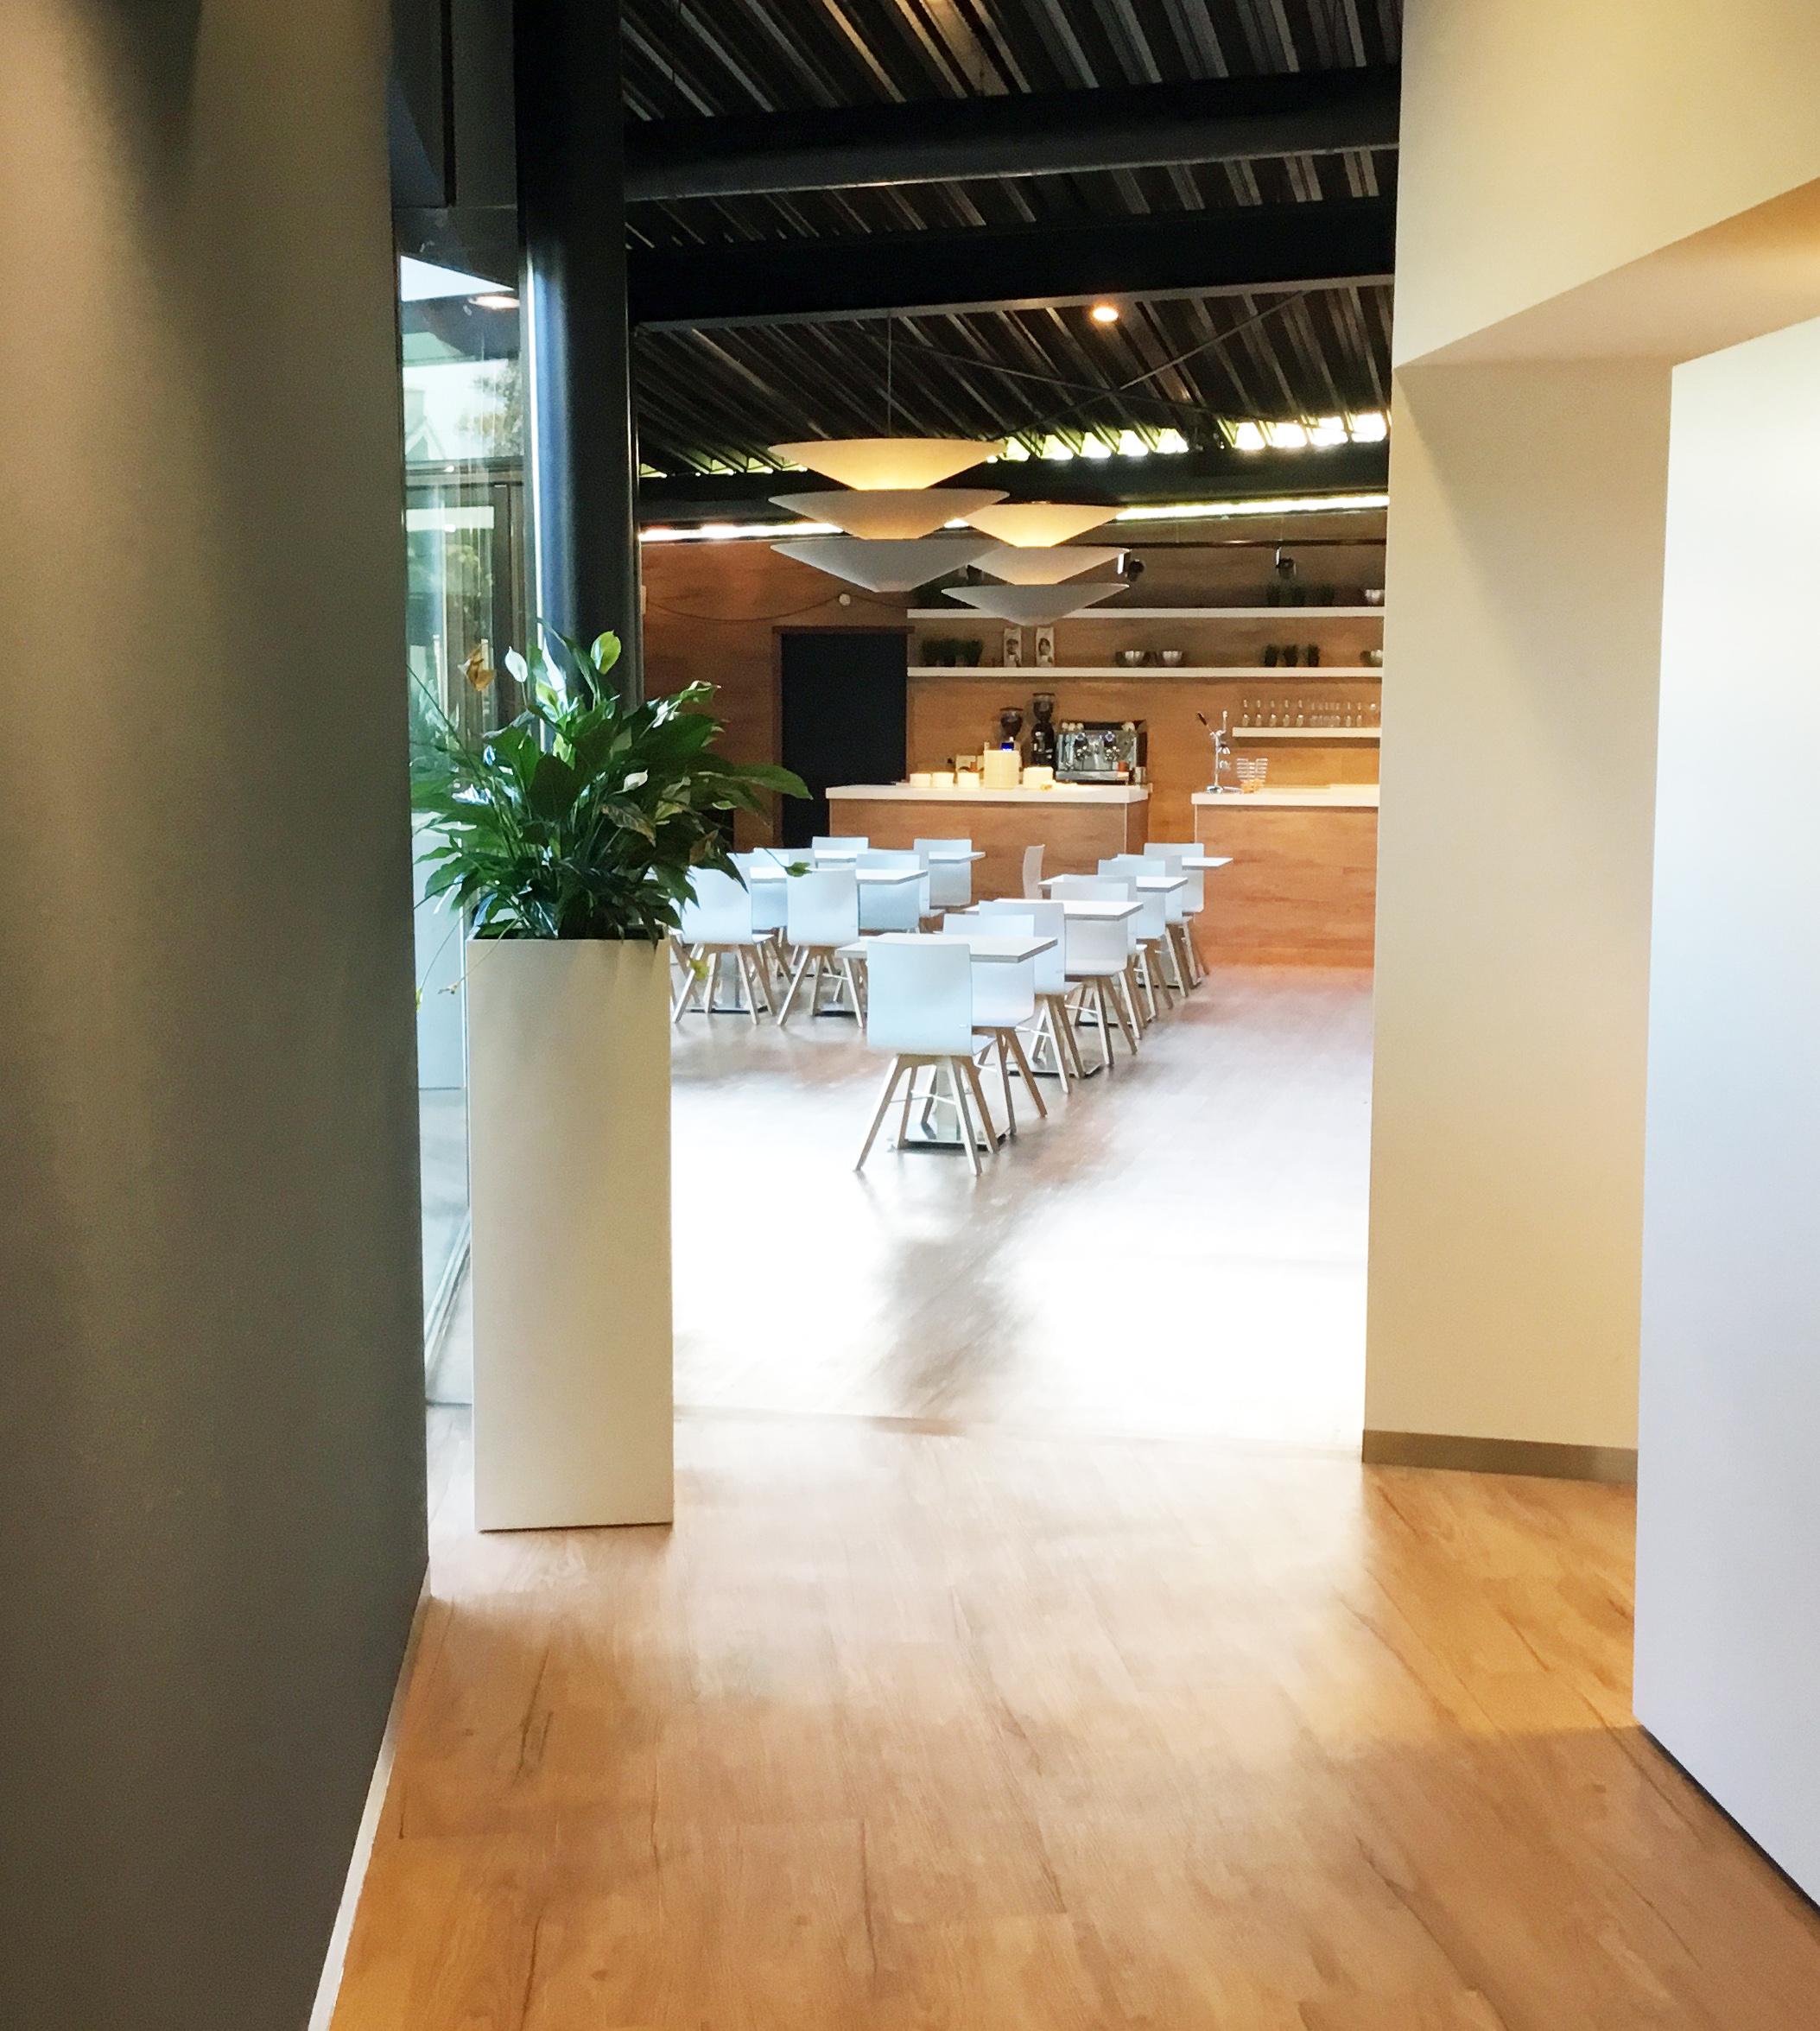 Proeflokaal laeren paul paternotte for Design appartement zwitserland